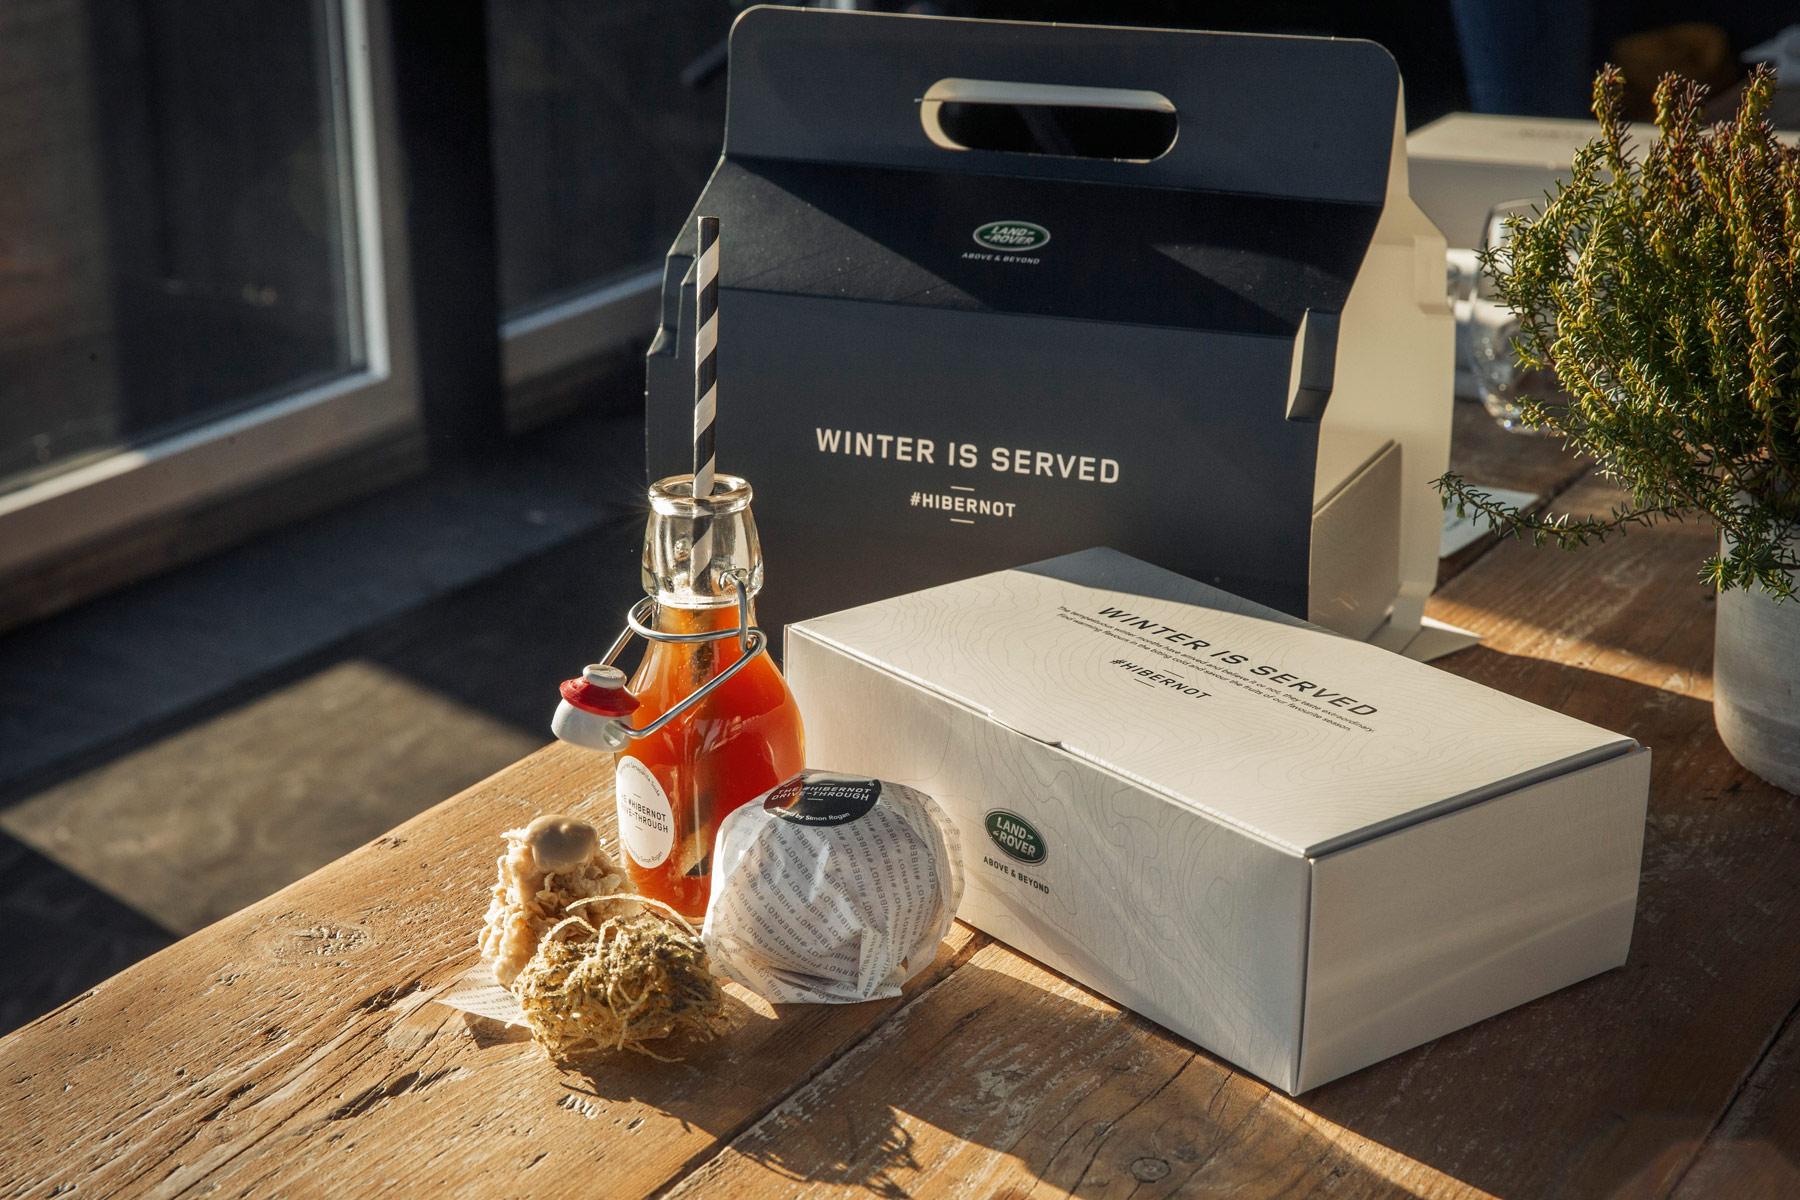 Land Rover & Chef Simon Rogan Create World's First Luxury Drive-Through 7